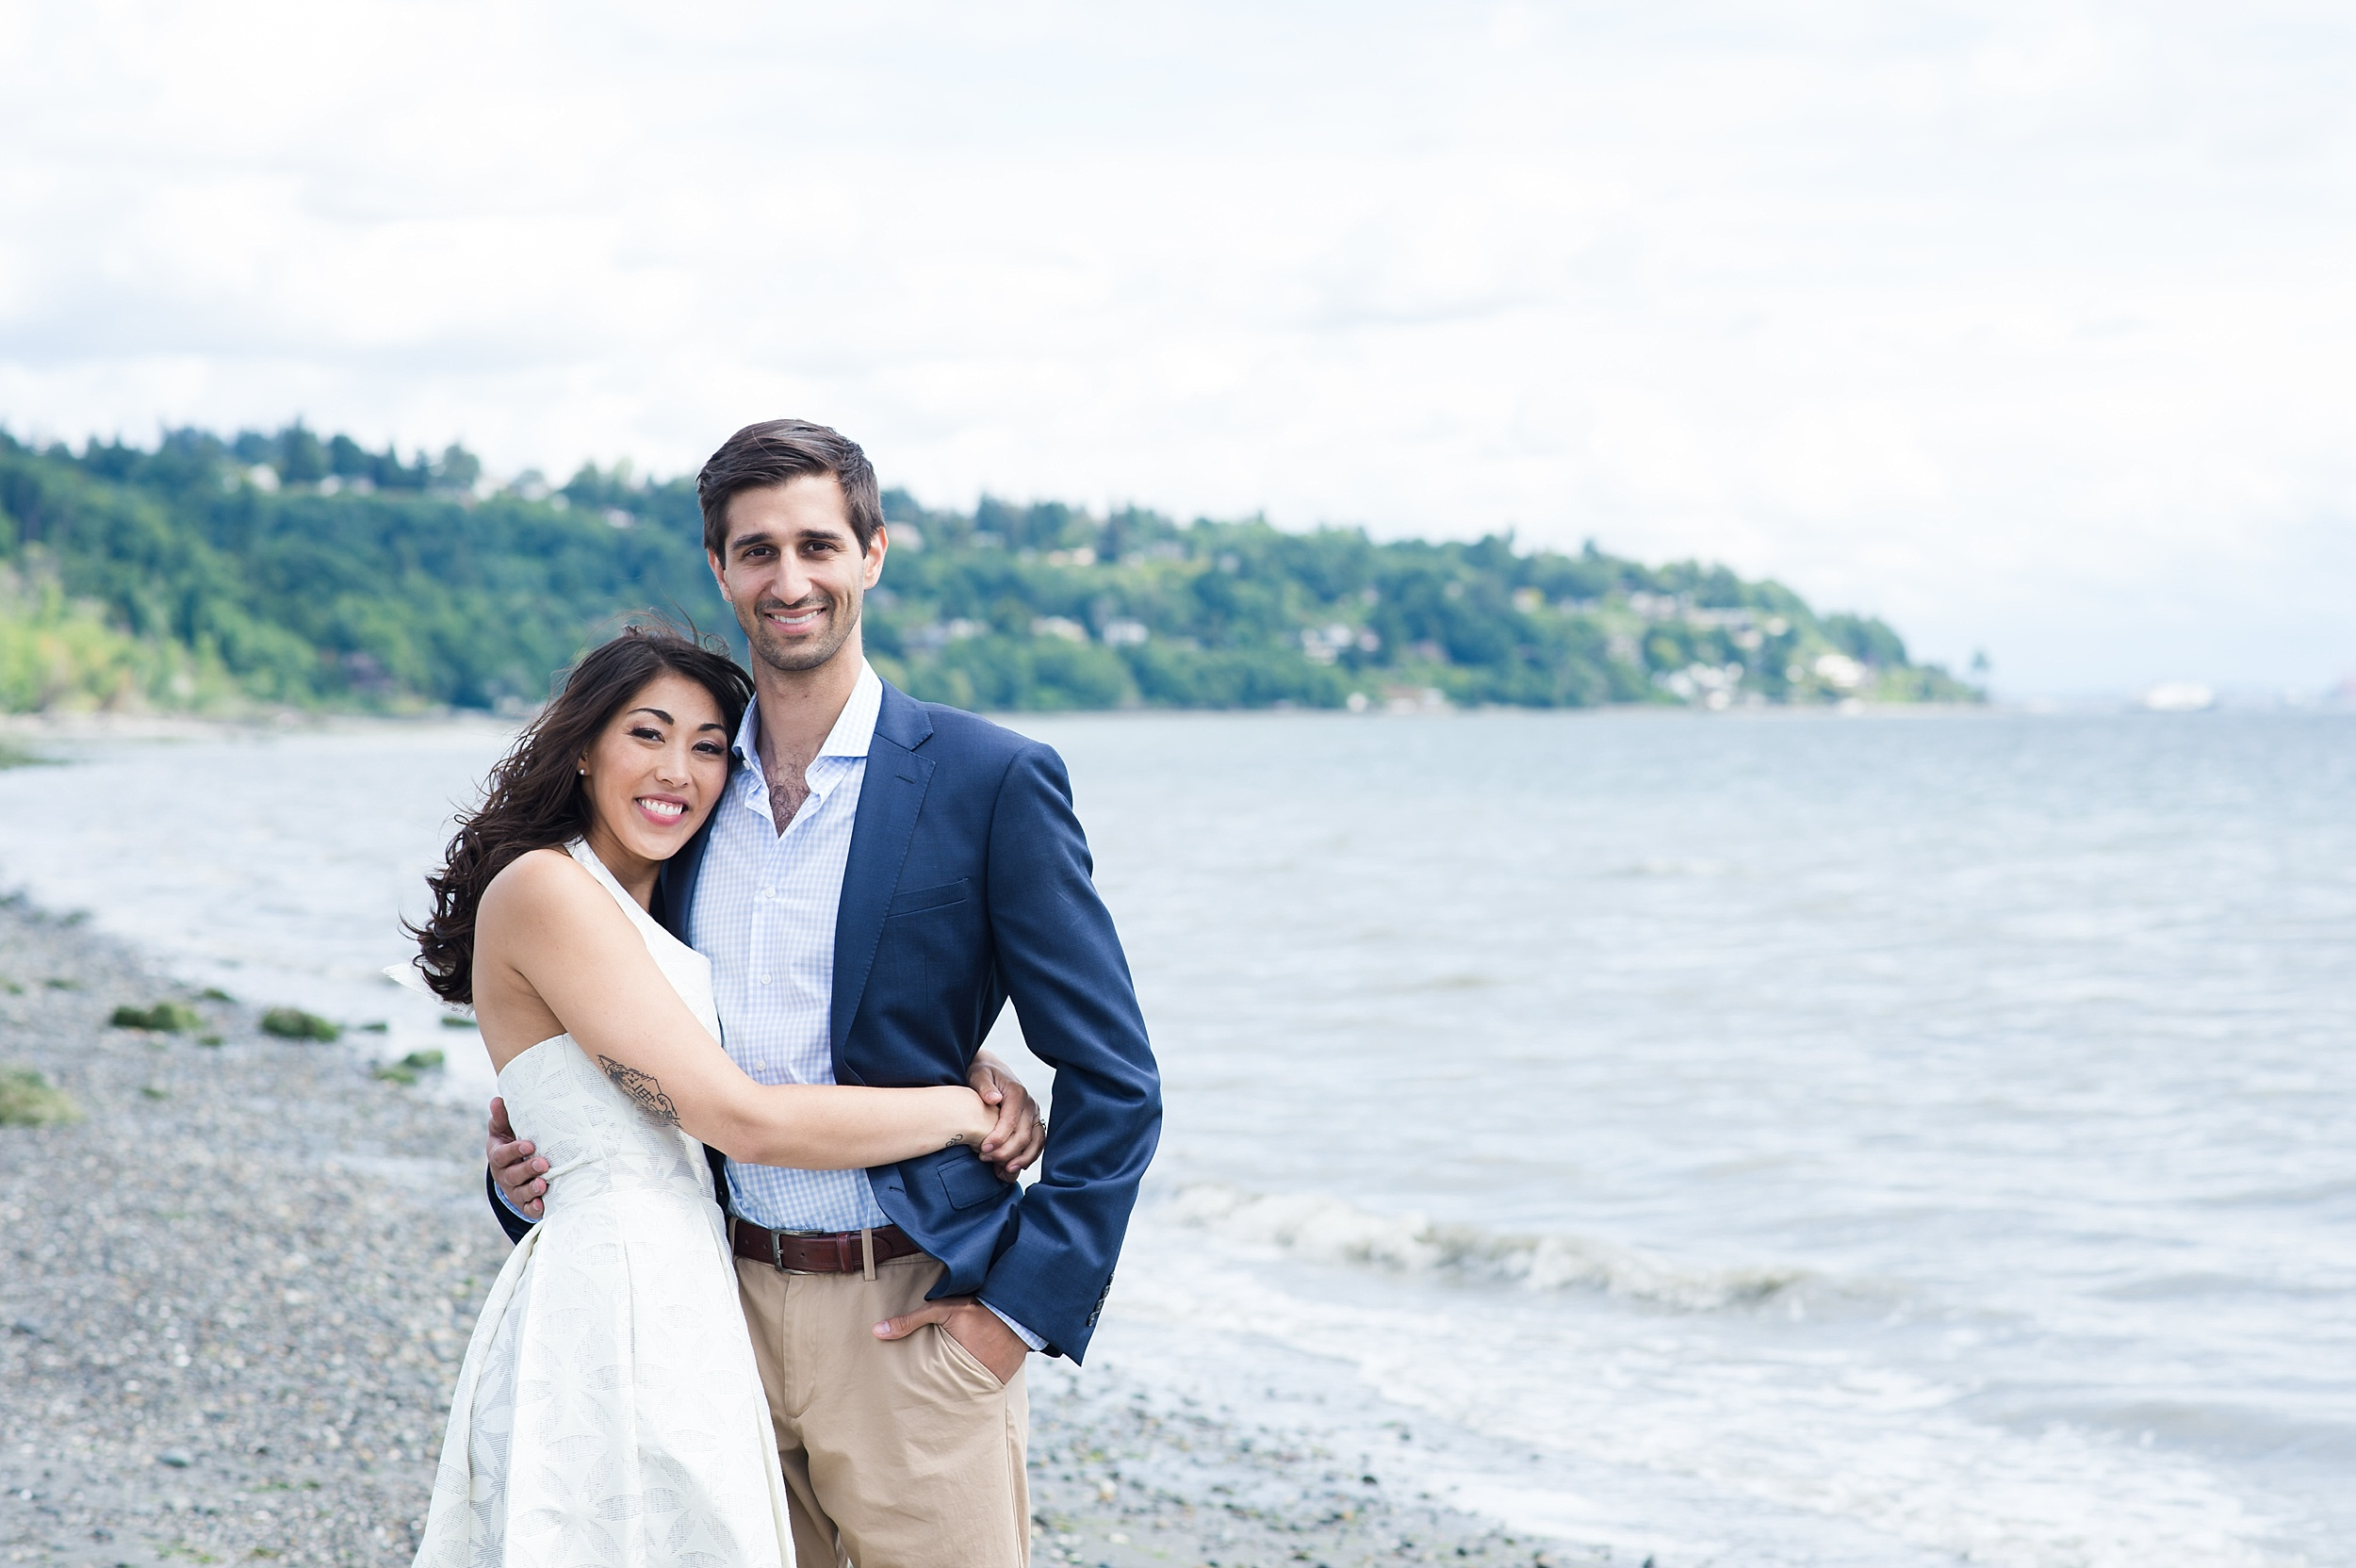 lockandco-virginia-dc-maryland-weddings-portraits-engagements_0021.jpg